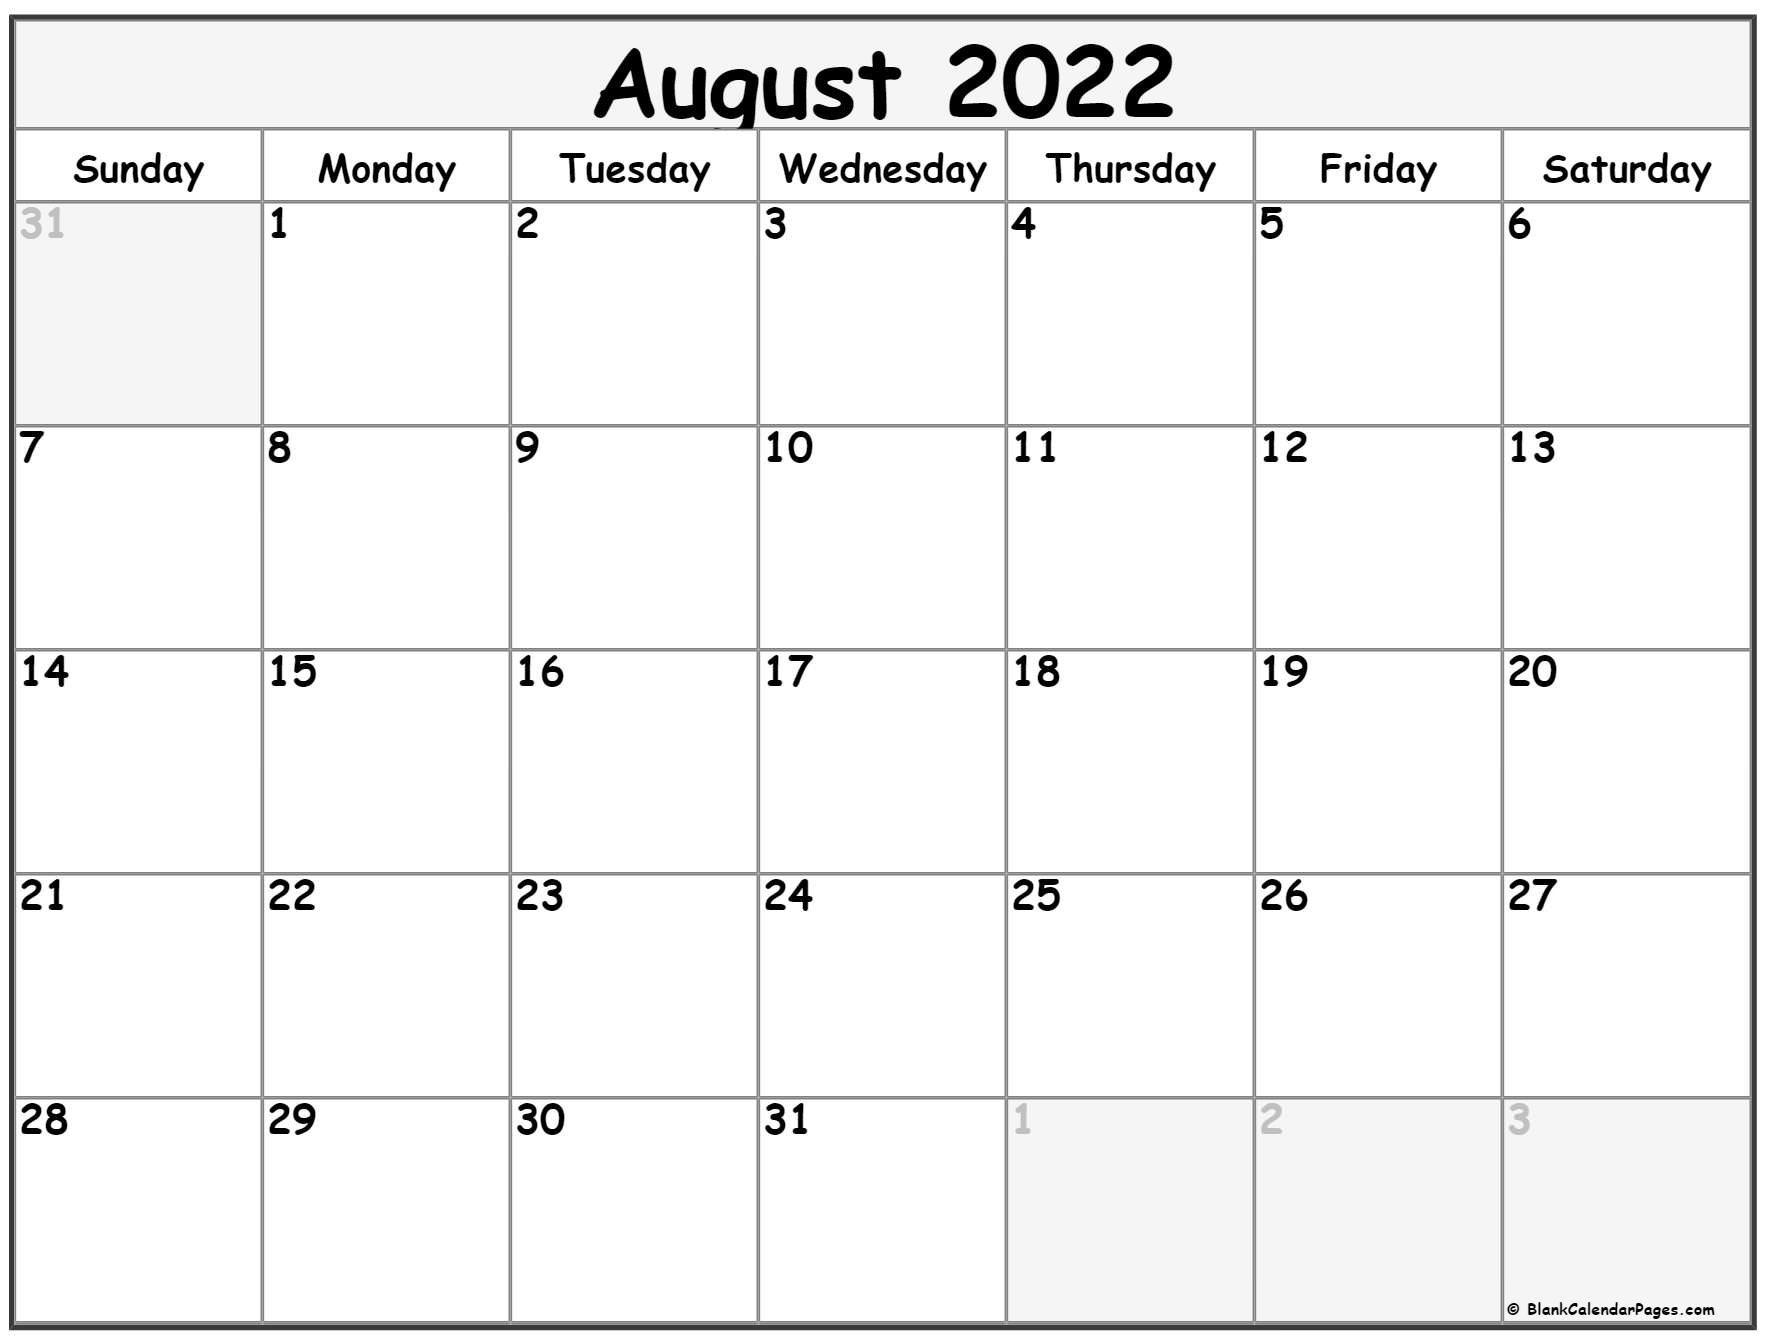 August 2022 Calendar   Free Printable Calendar Templates with Printable 2022 August Calendar Photo